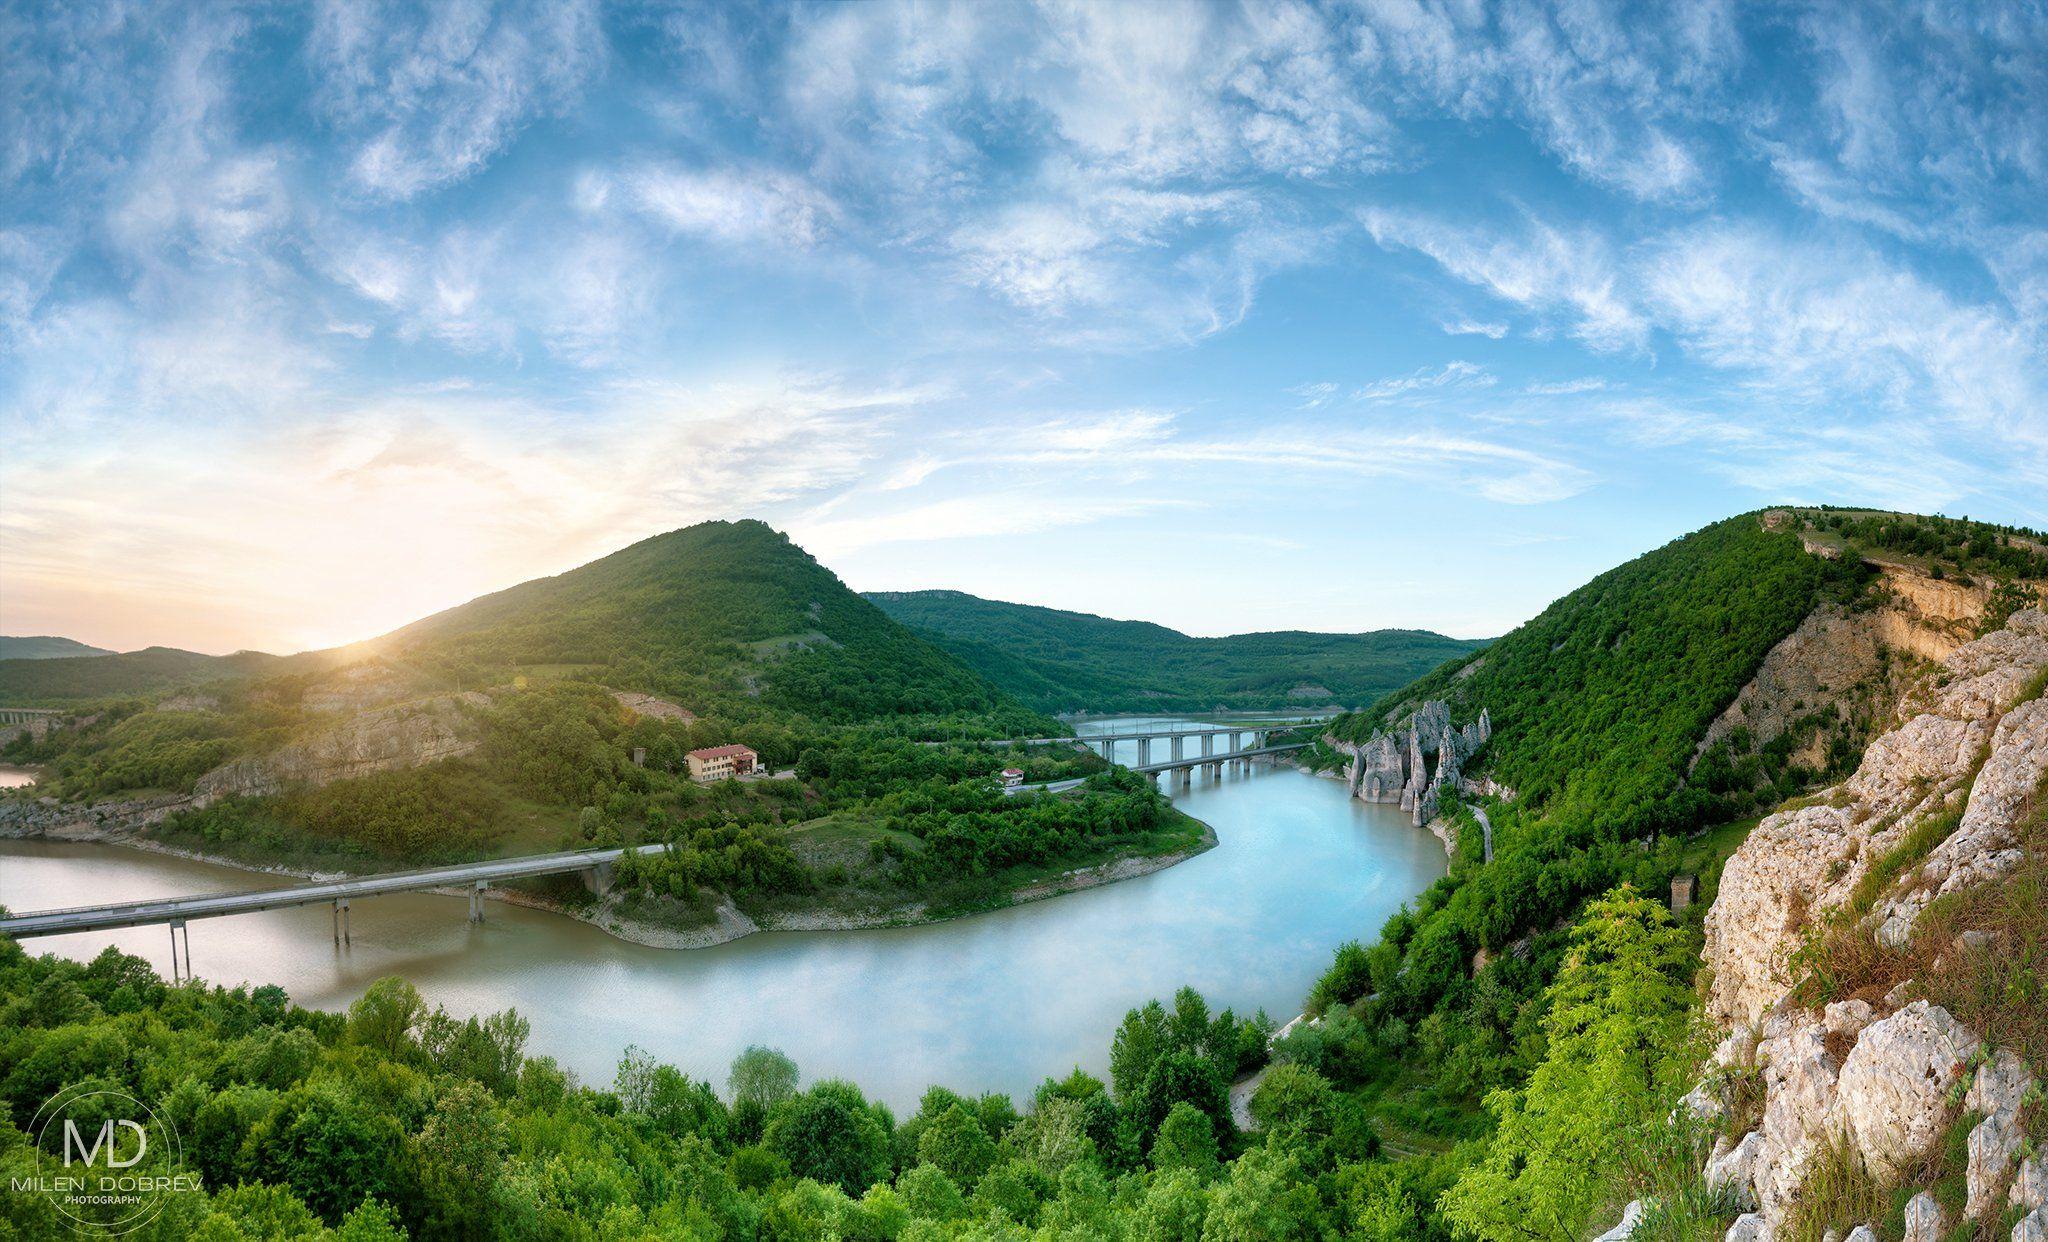 Bulgaria, sunset, landscape, view, spring, scenic, Милен Добрев